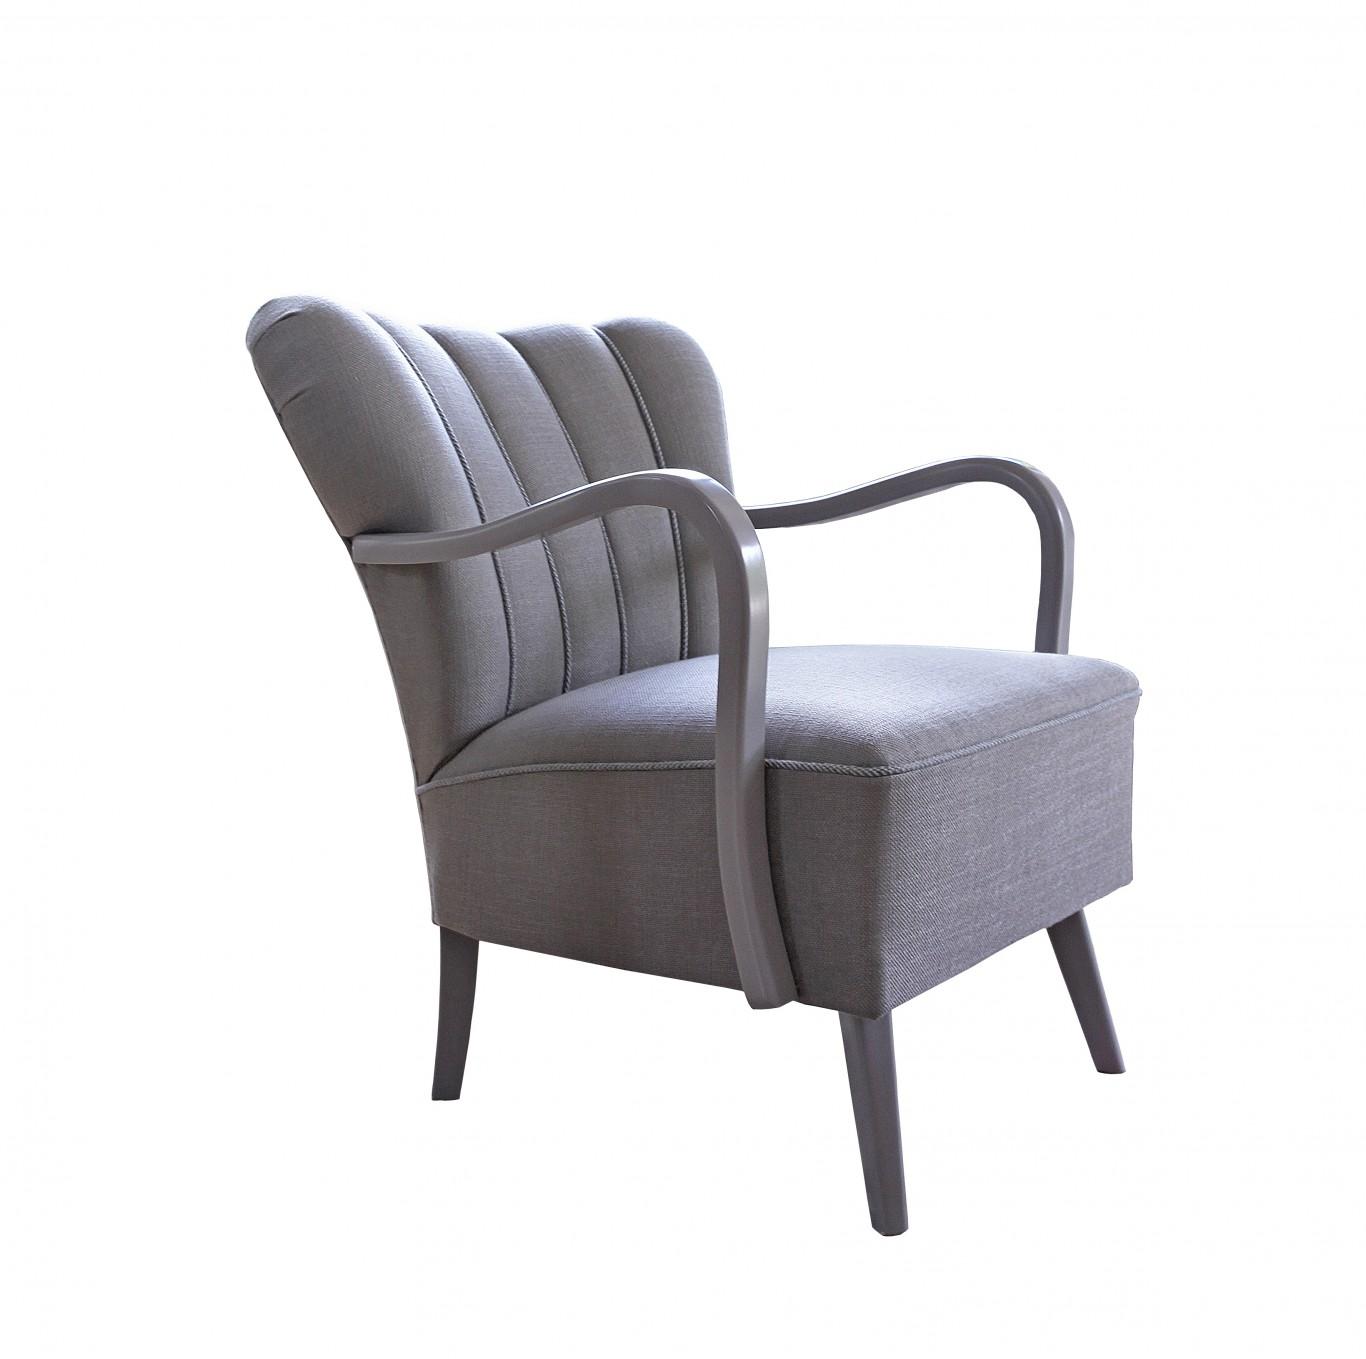 Piu fotel